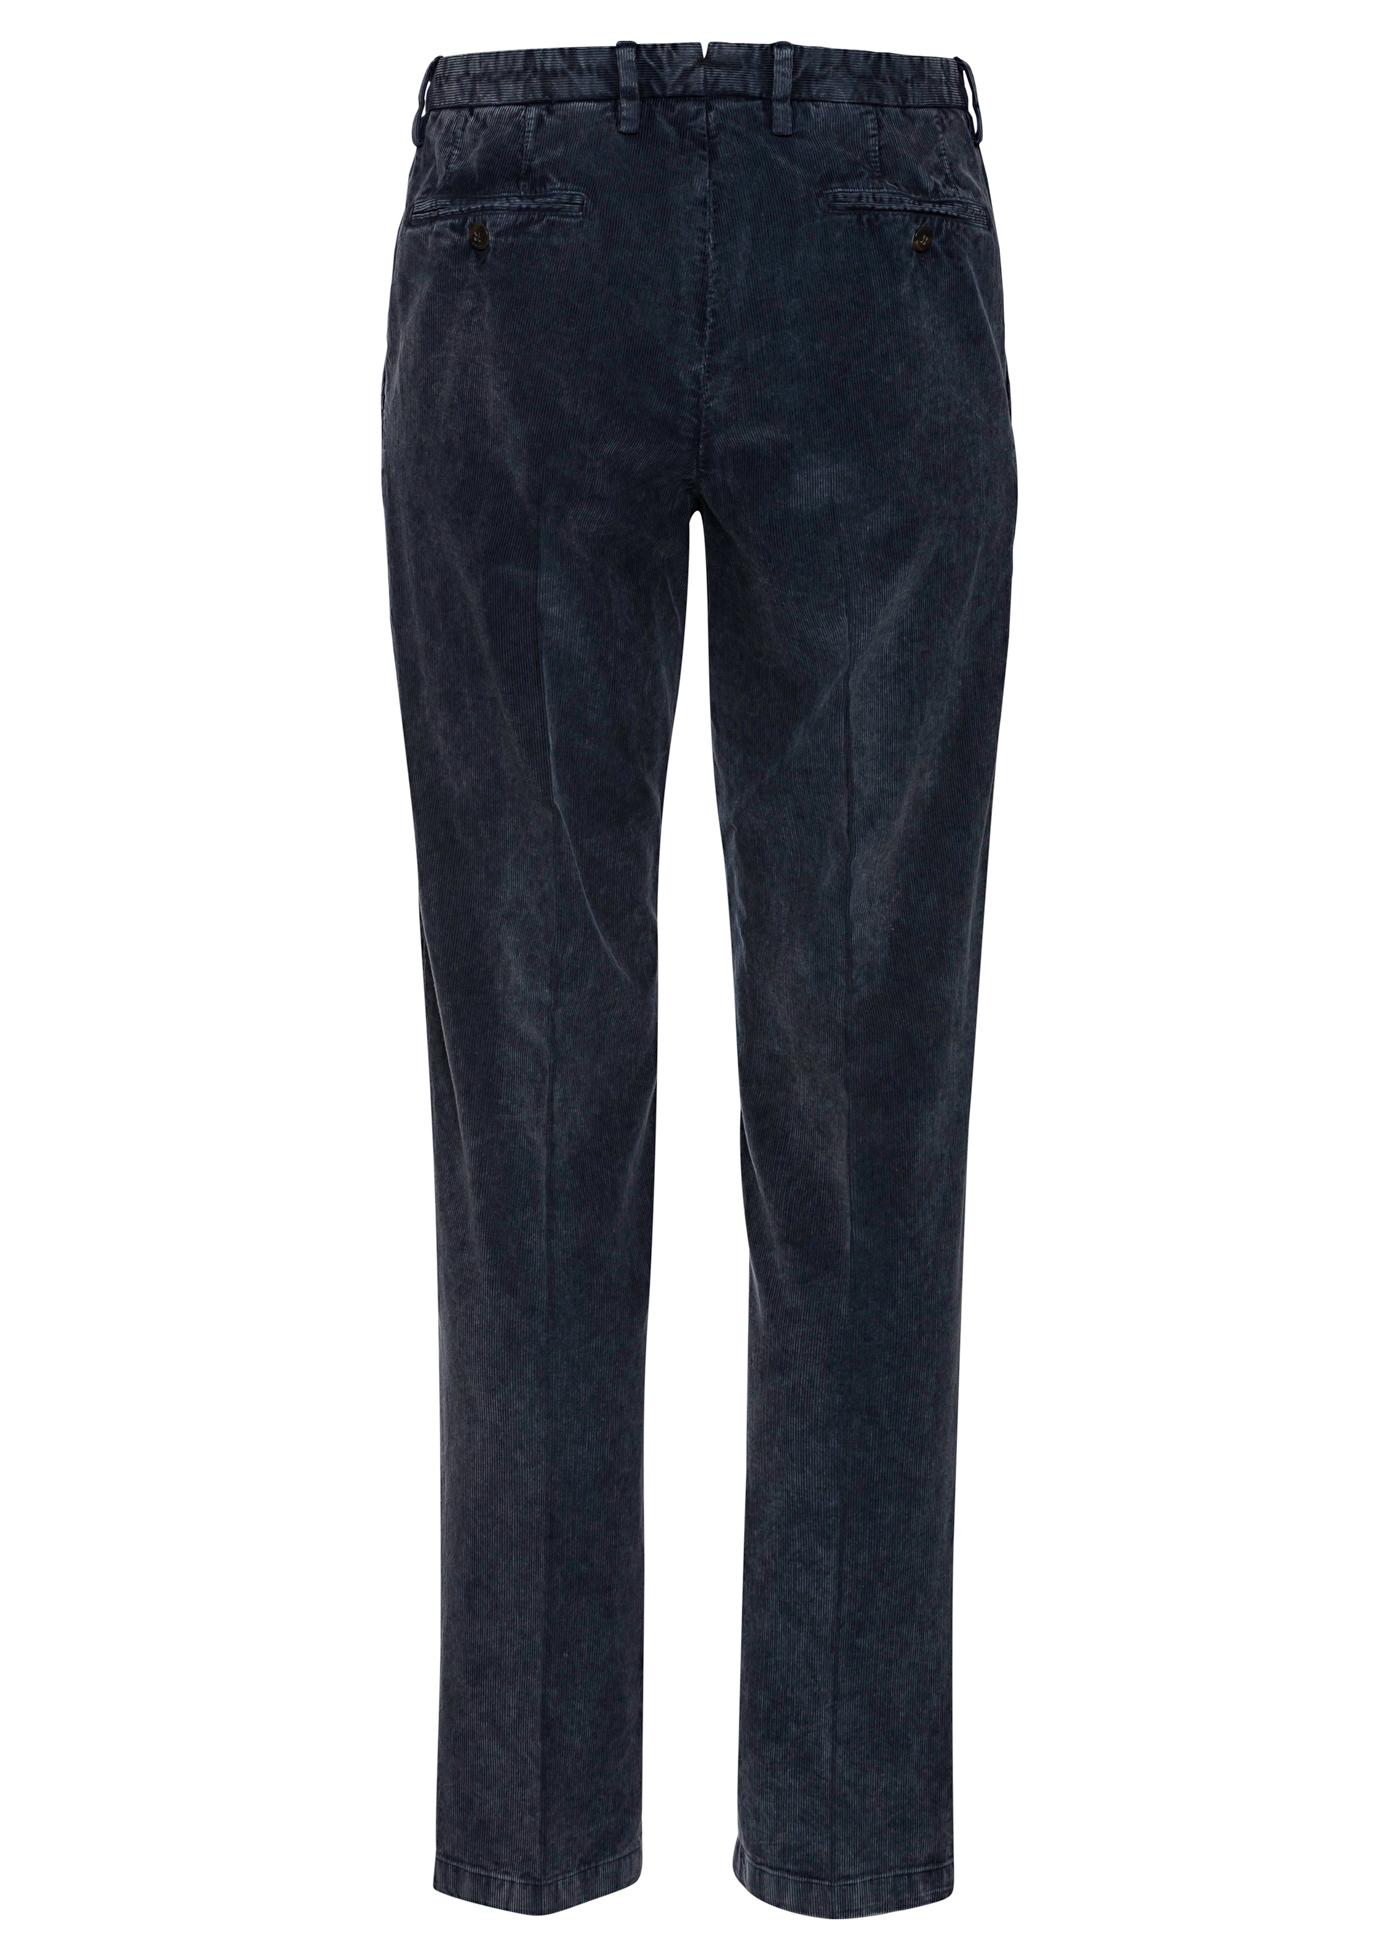 Washed Corduroy Pants image number 1